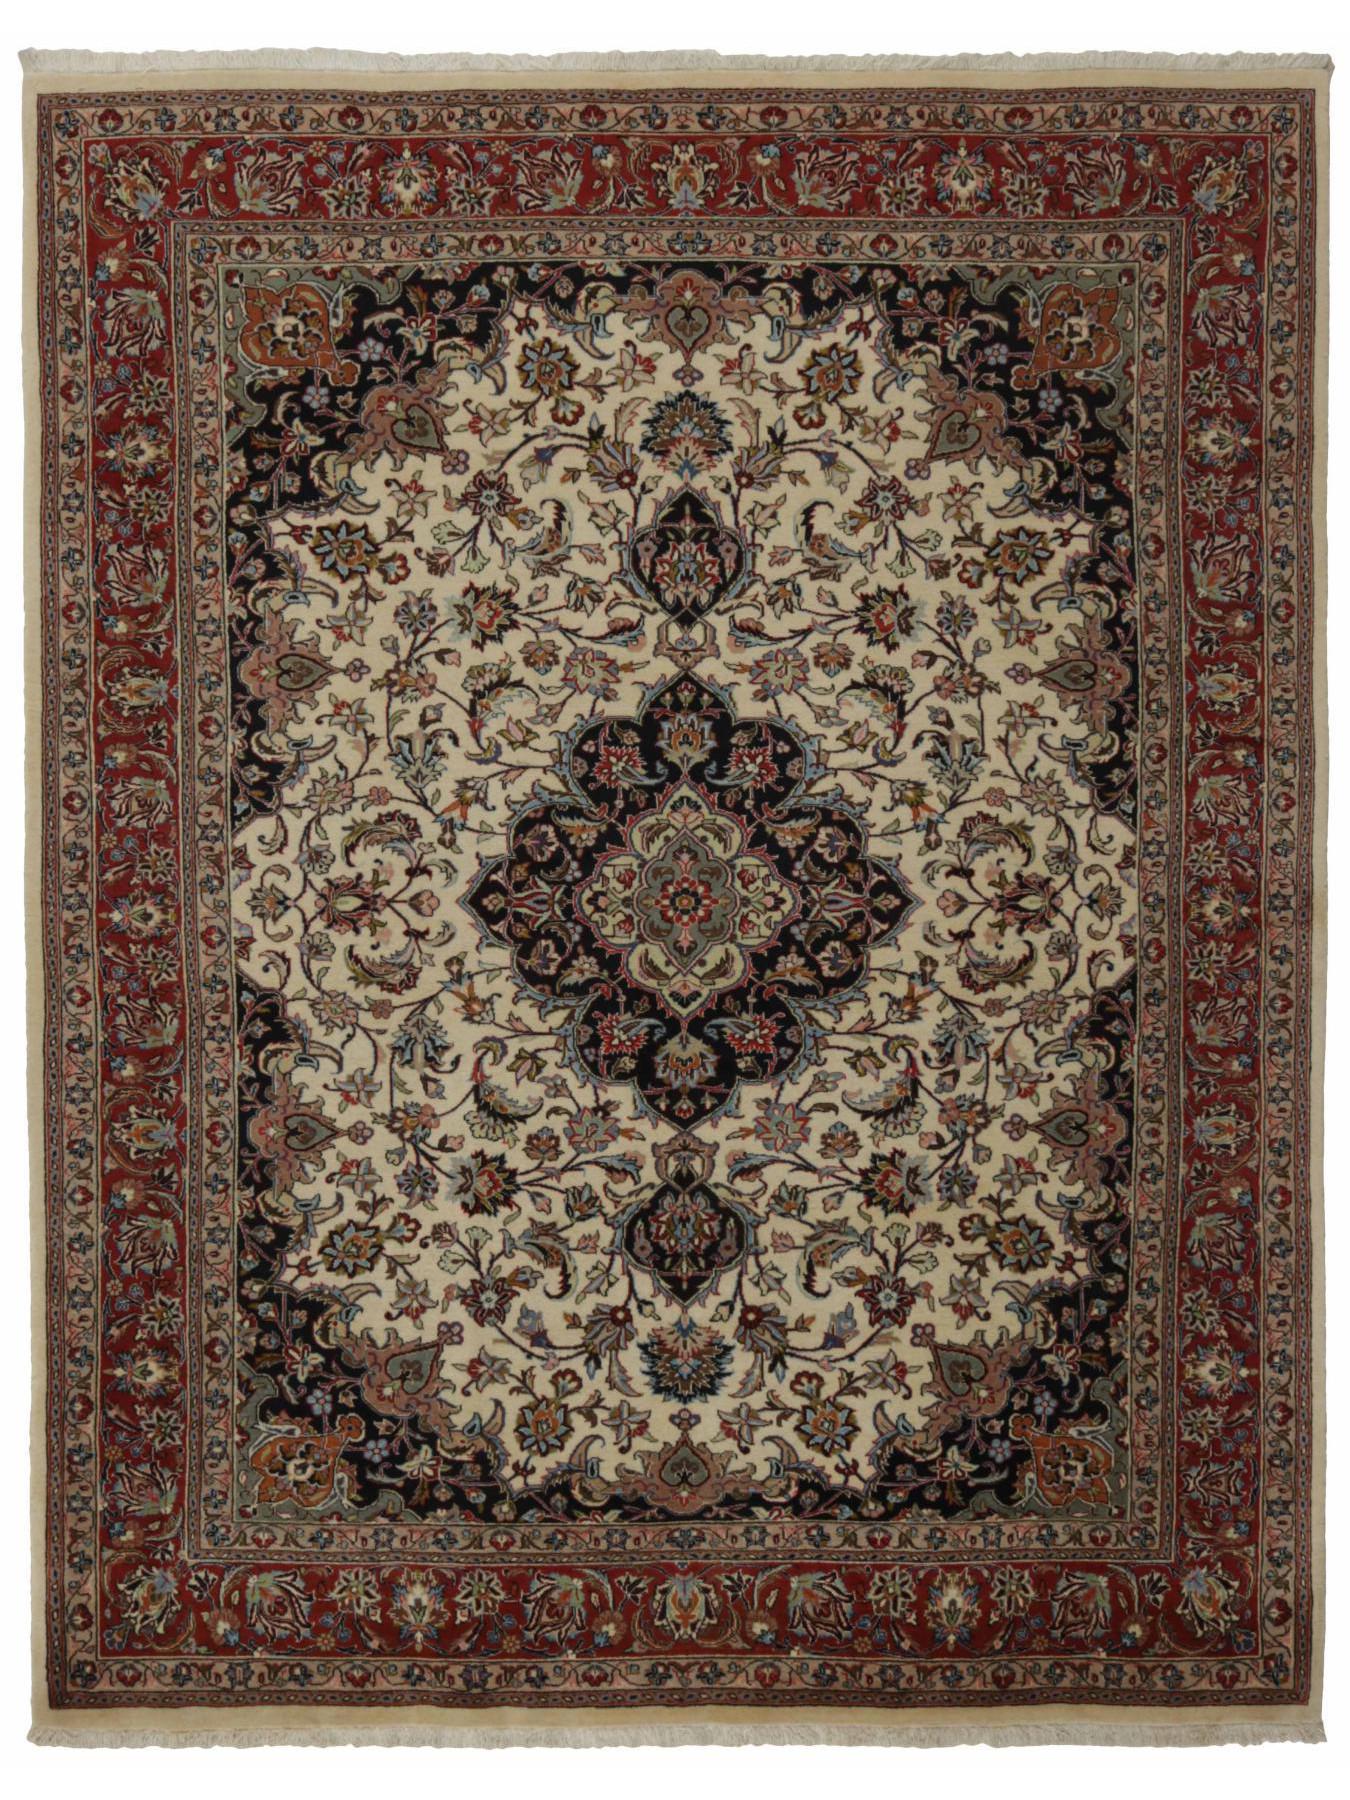 Perzische tapijten - Kashmar Sherkat